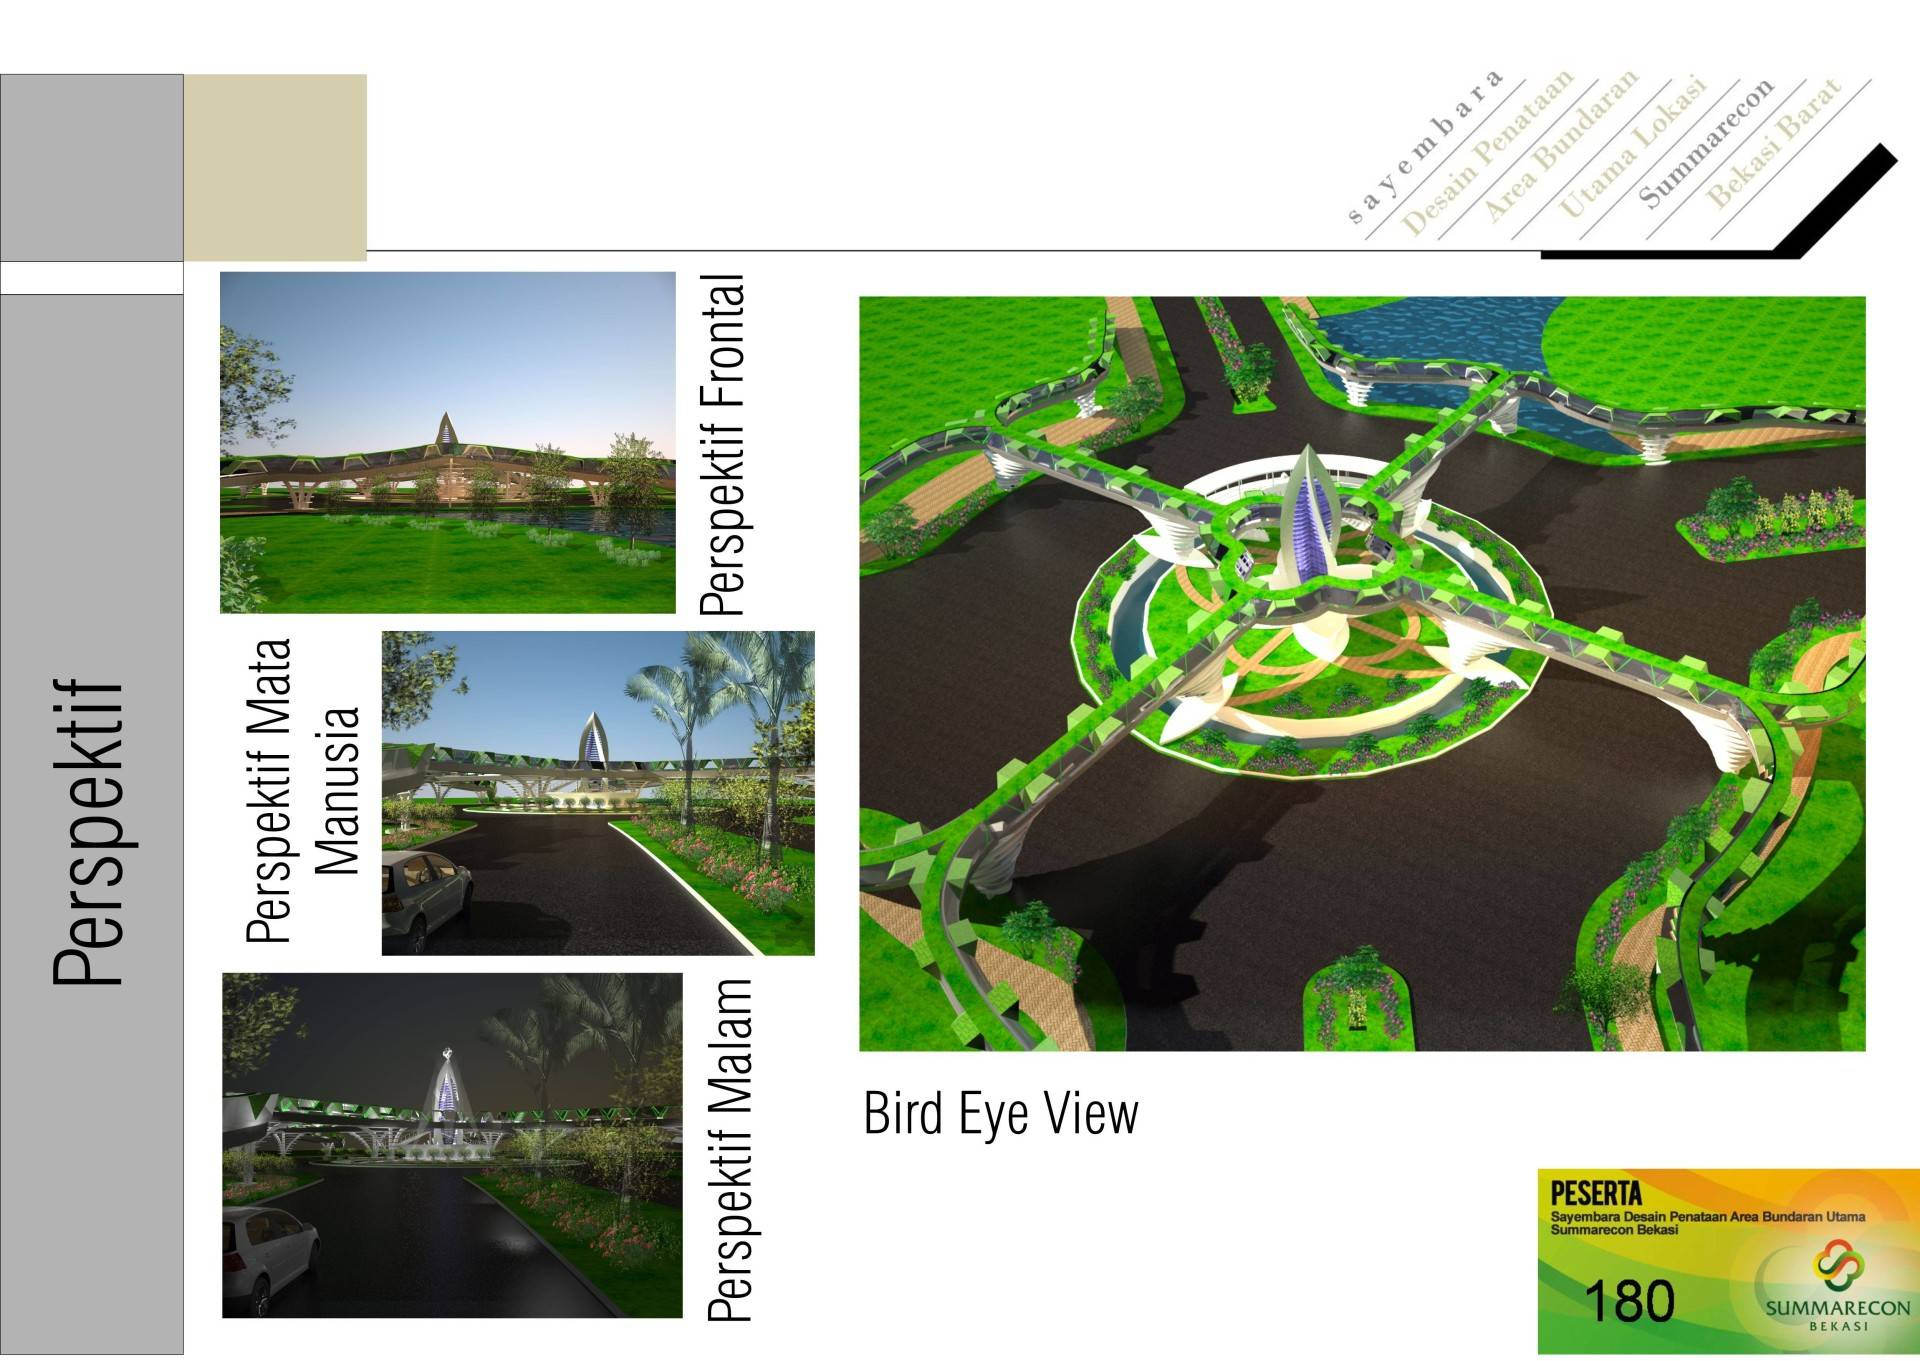 Aristokrasi Prima Rivan Consultan Summarecon At Bekasi City Bekasi, West Java Bekasi, West Java Perspektif   3273